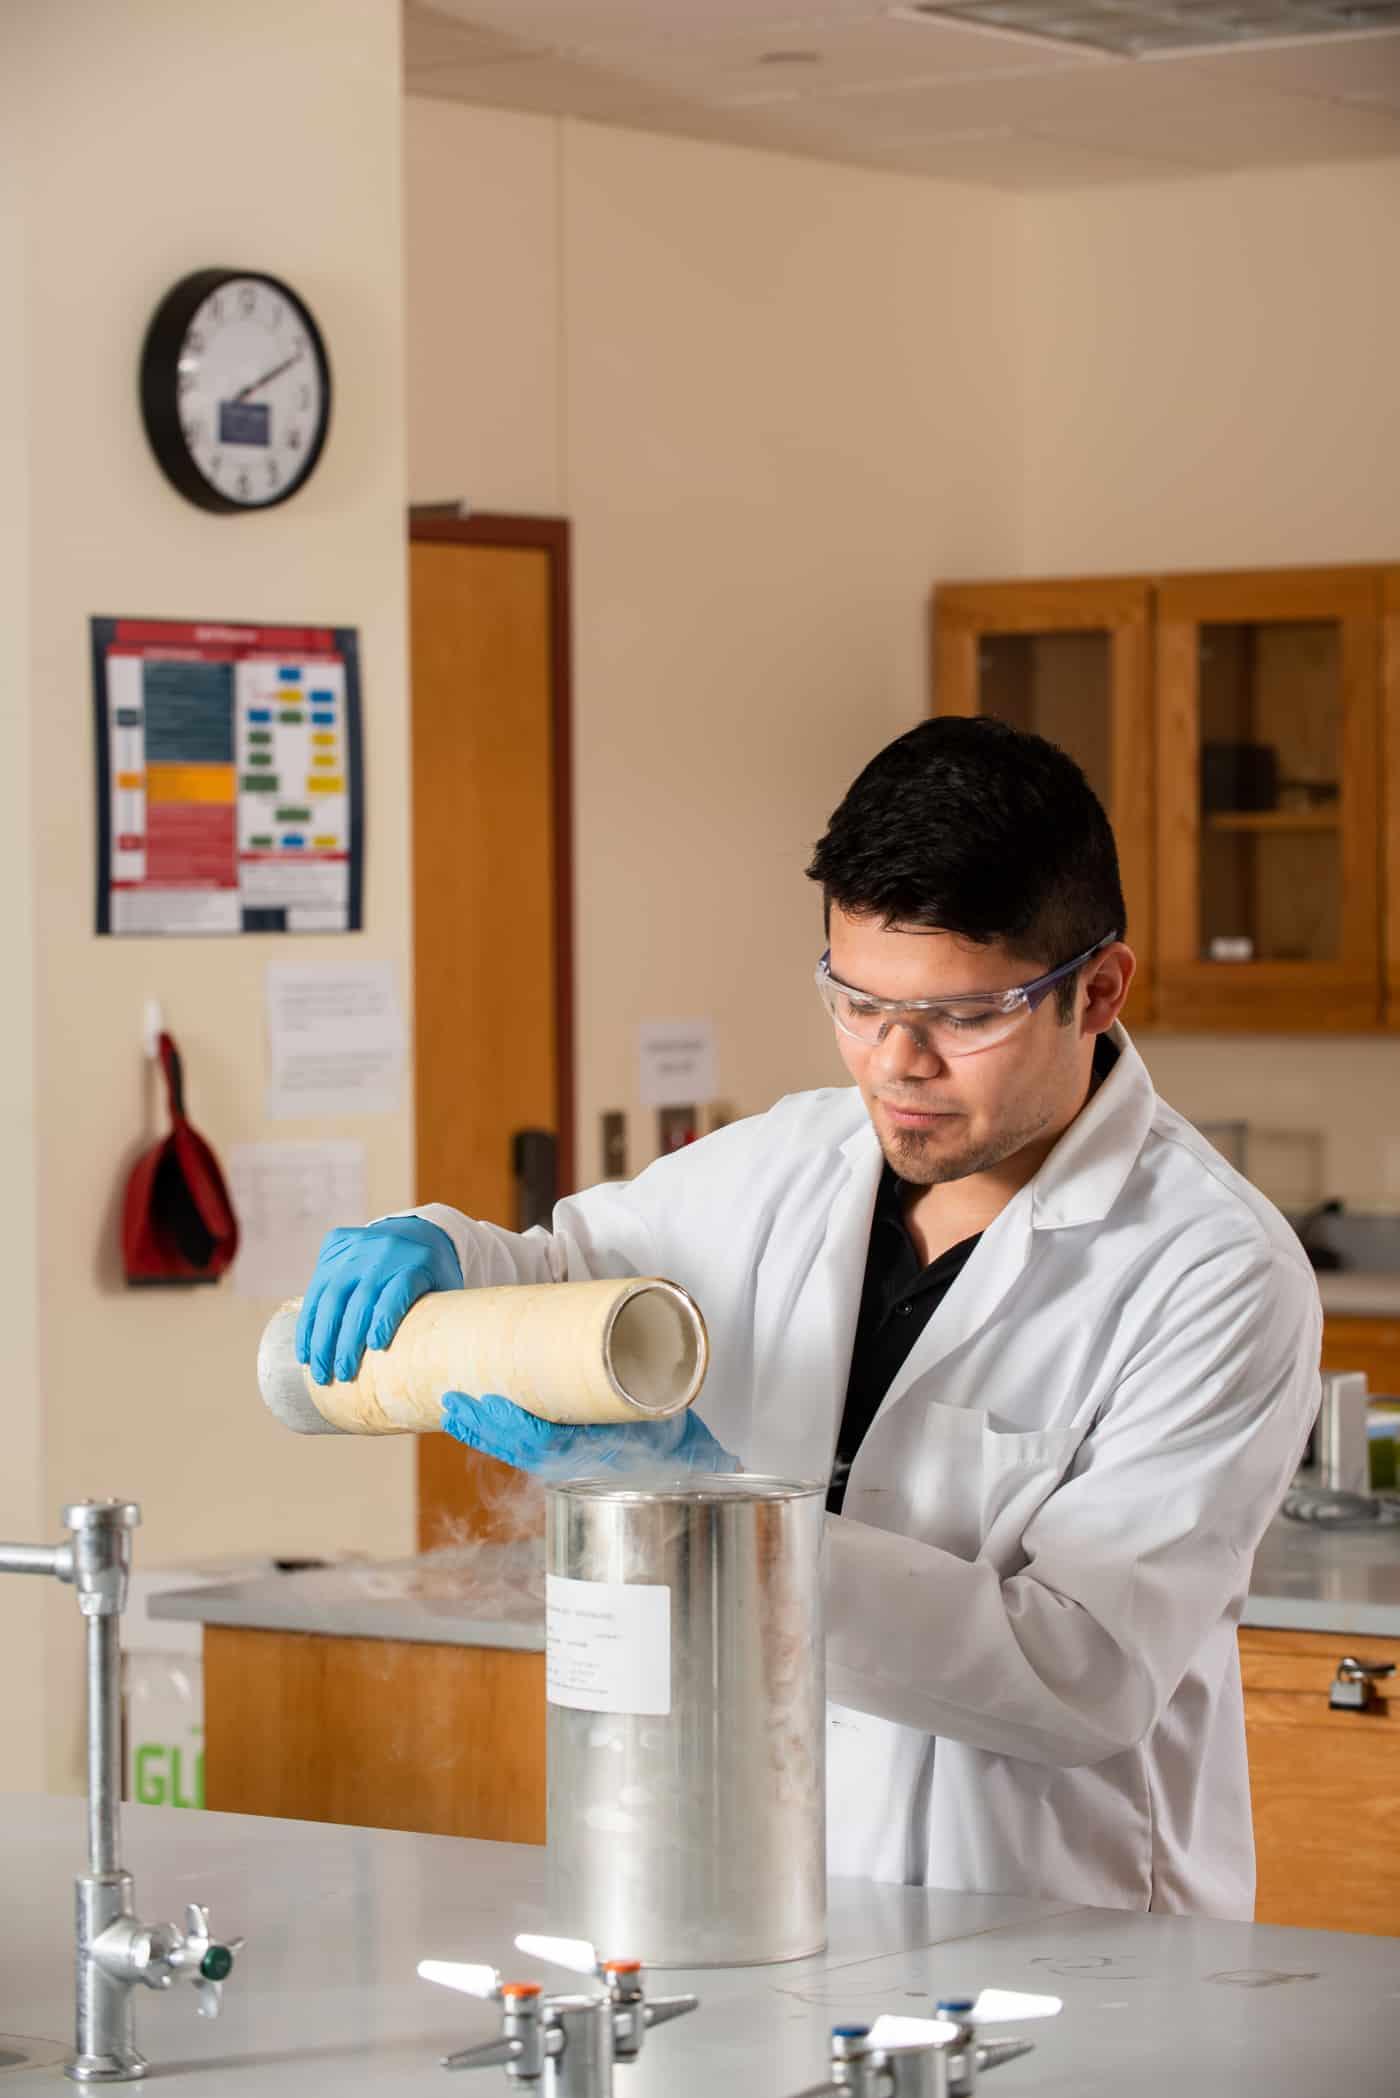 Chemist pouring liquid nitrogen into container